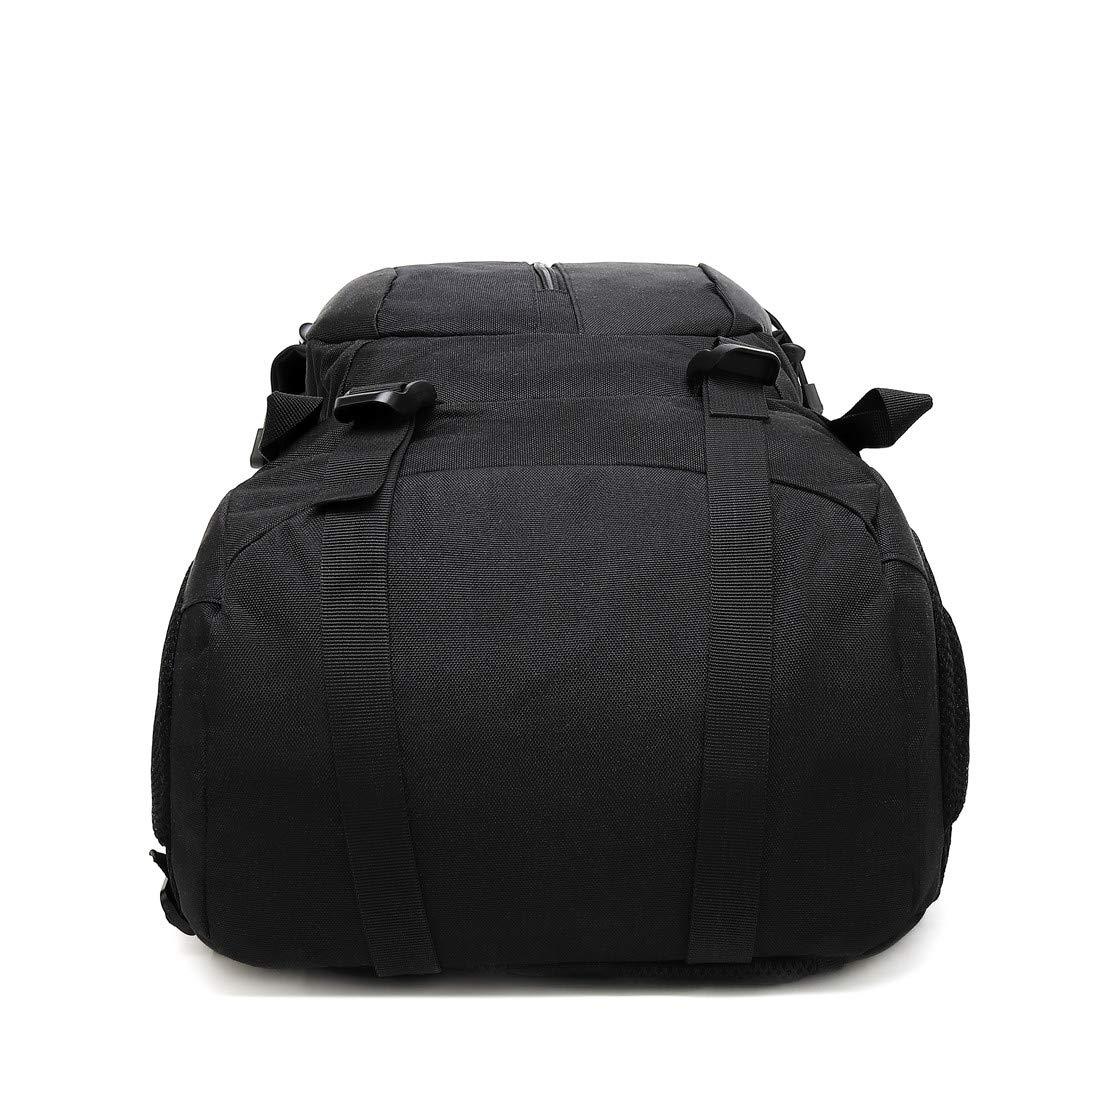 marr/ón JOTHIN 40L Deportes y Aire Libre Mochilas de Camping Nylon Mochila T/áctica Militar Grandes Trekking Backpack Impermeable Hombre Bolsa de Senderismo